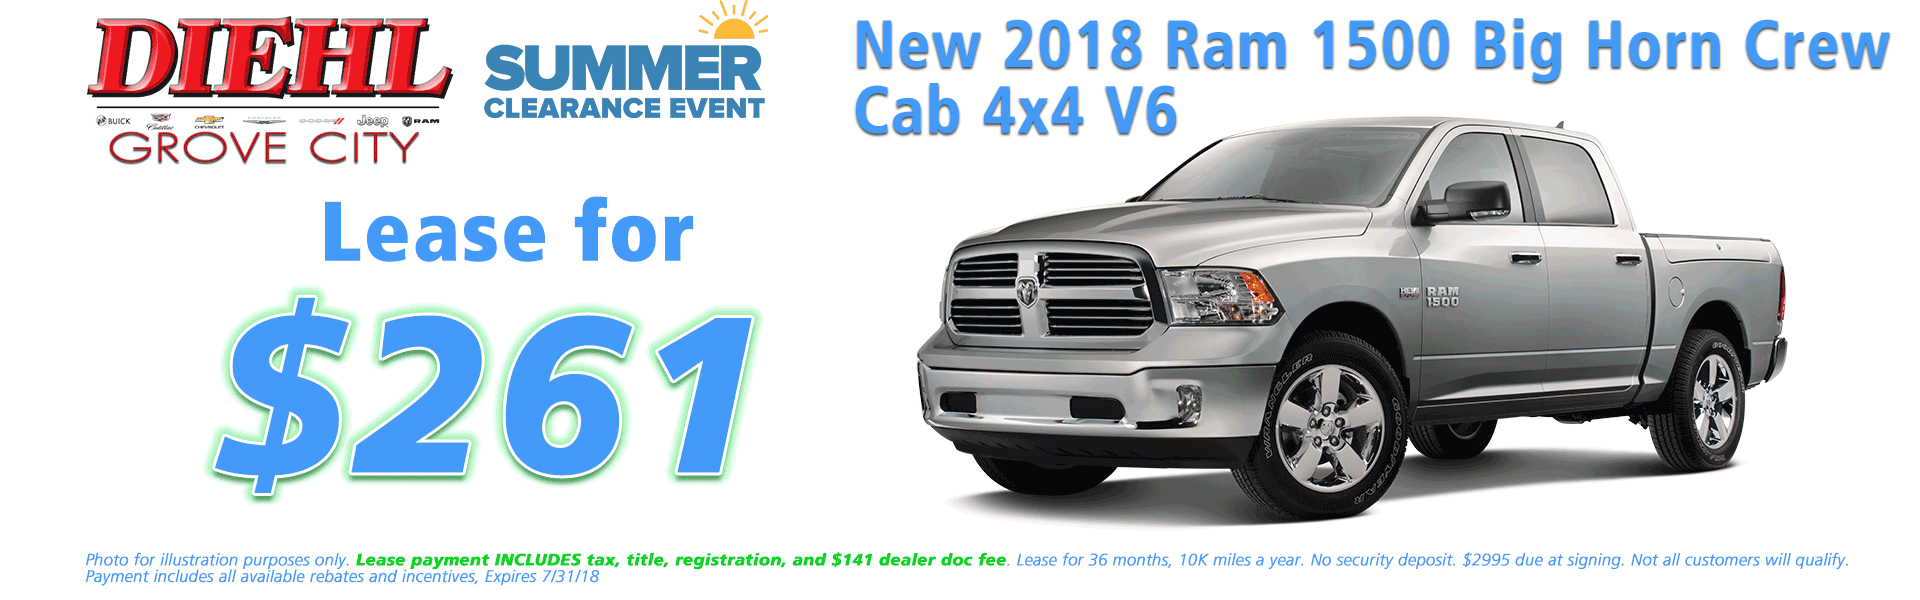 Diehl of Grove City, Grove City, PA 16127 Chrysler Jeep Dodge Ram Chevrolet Buick Cadillac NEW 2018 RAM 1500 BIG HORN CREW CAB 4X4 5'7